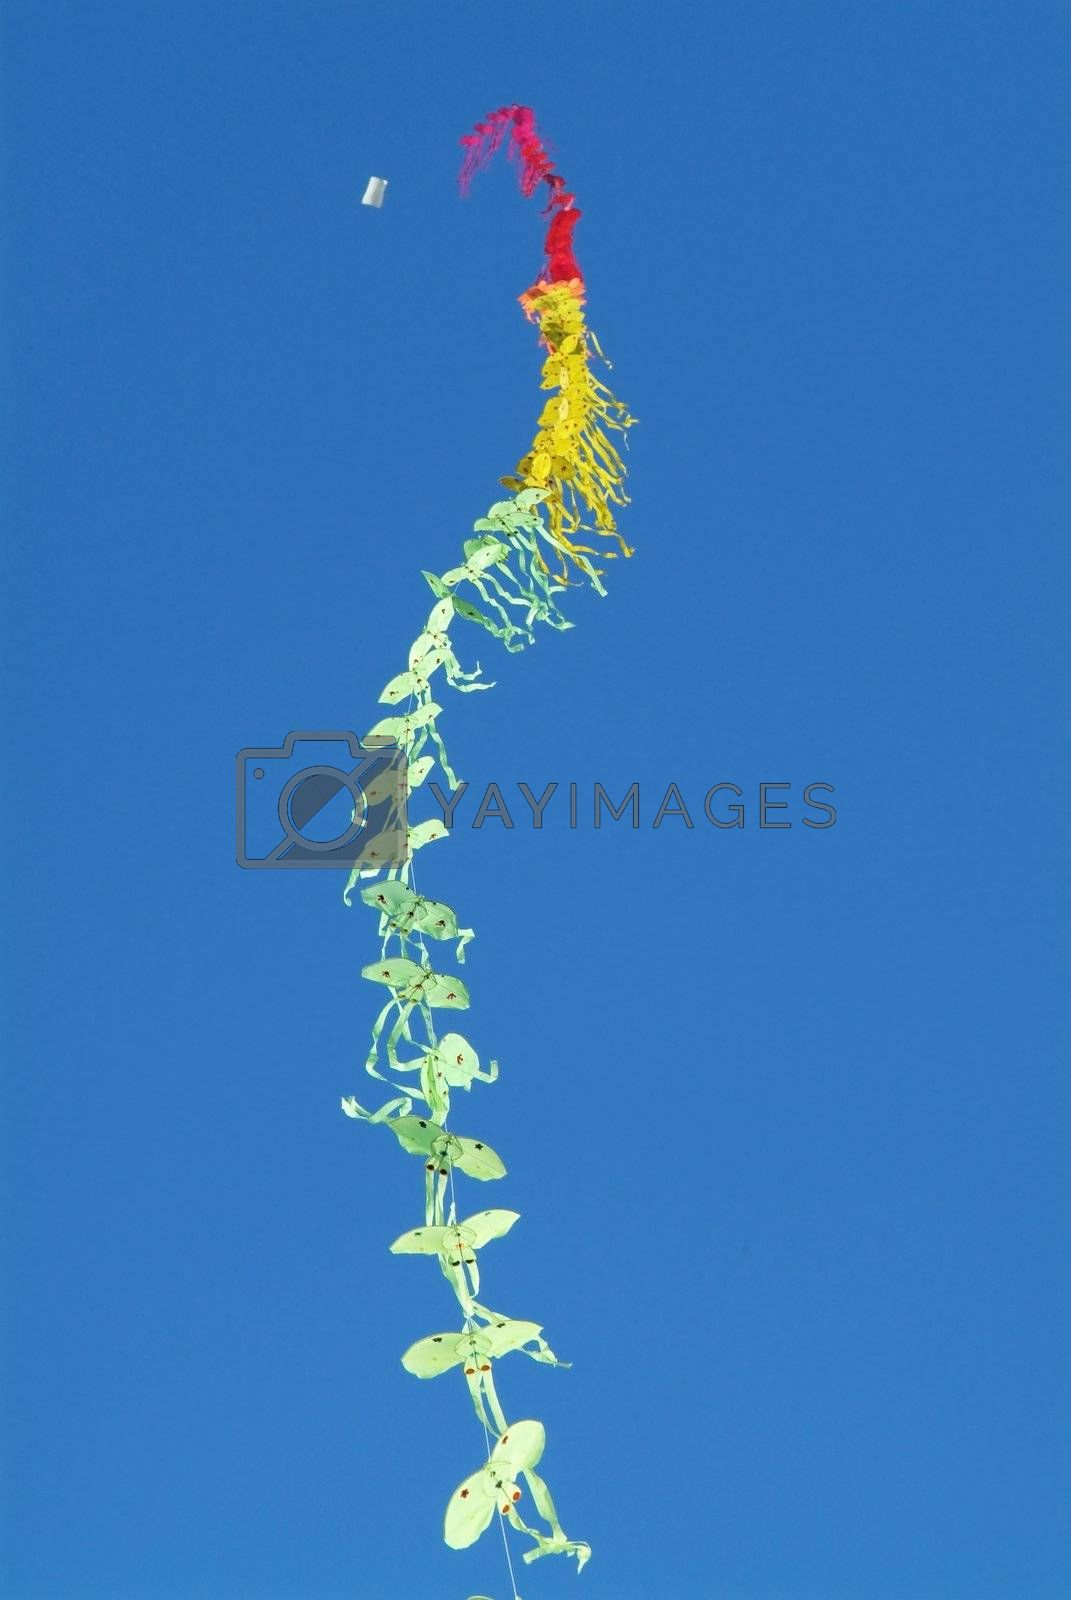 String of kites by epixx